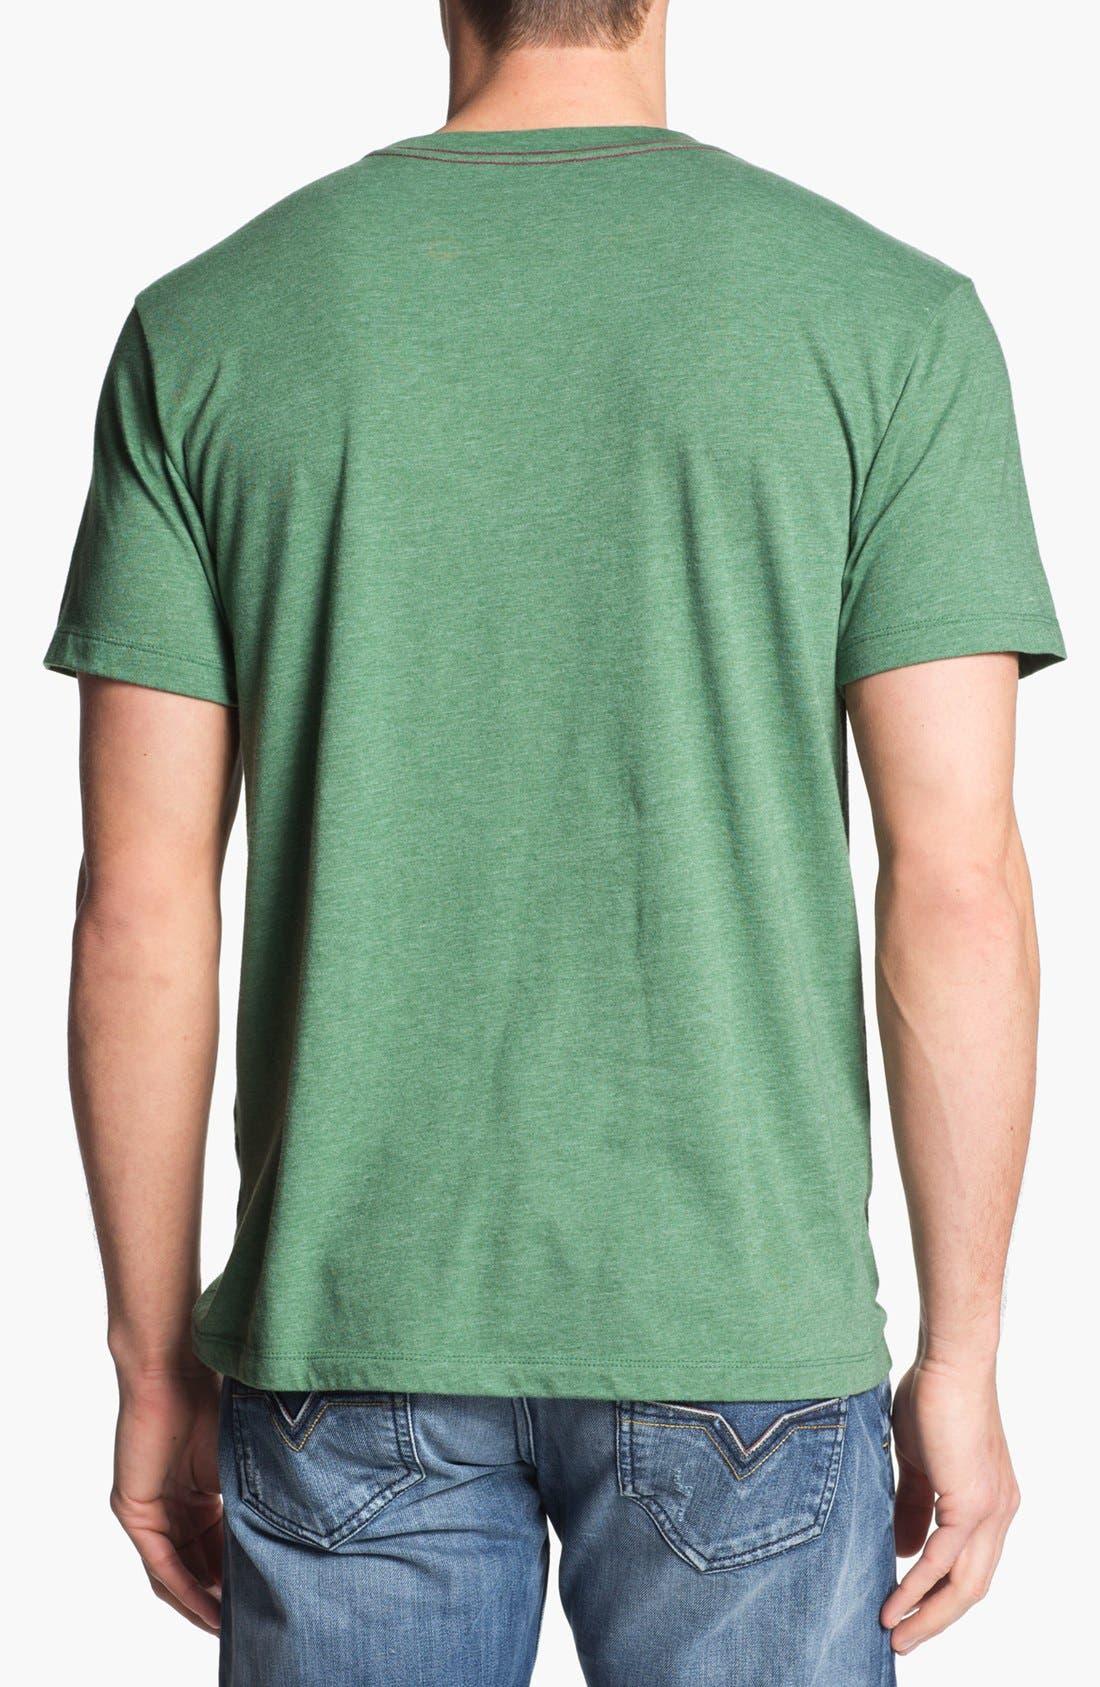 Alternate Image 2  - RVCA 'Bar Hex' Graphic T-Shirt